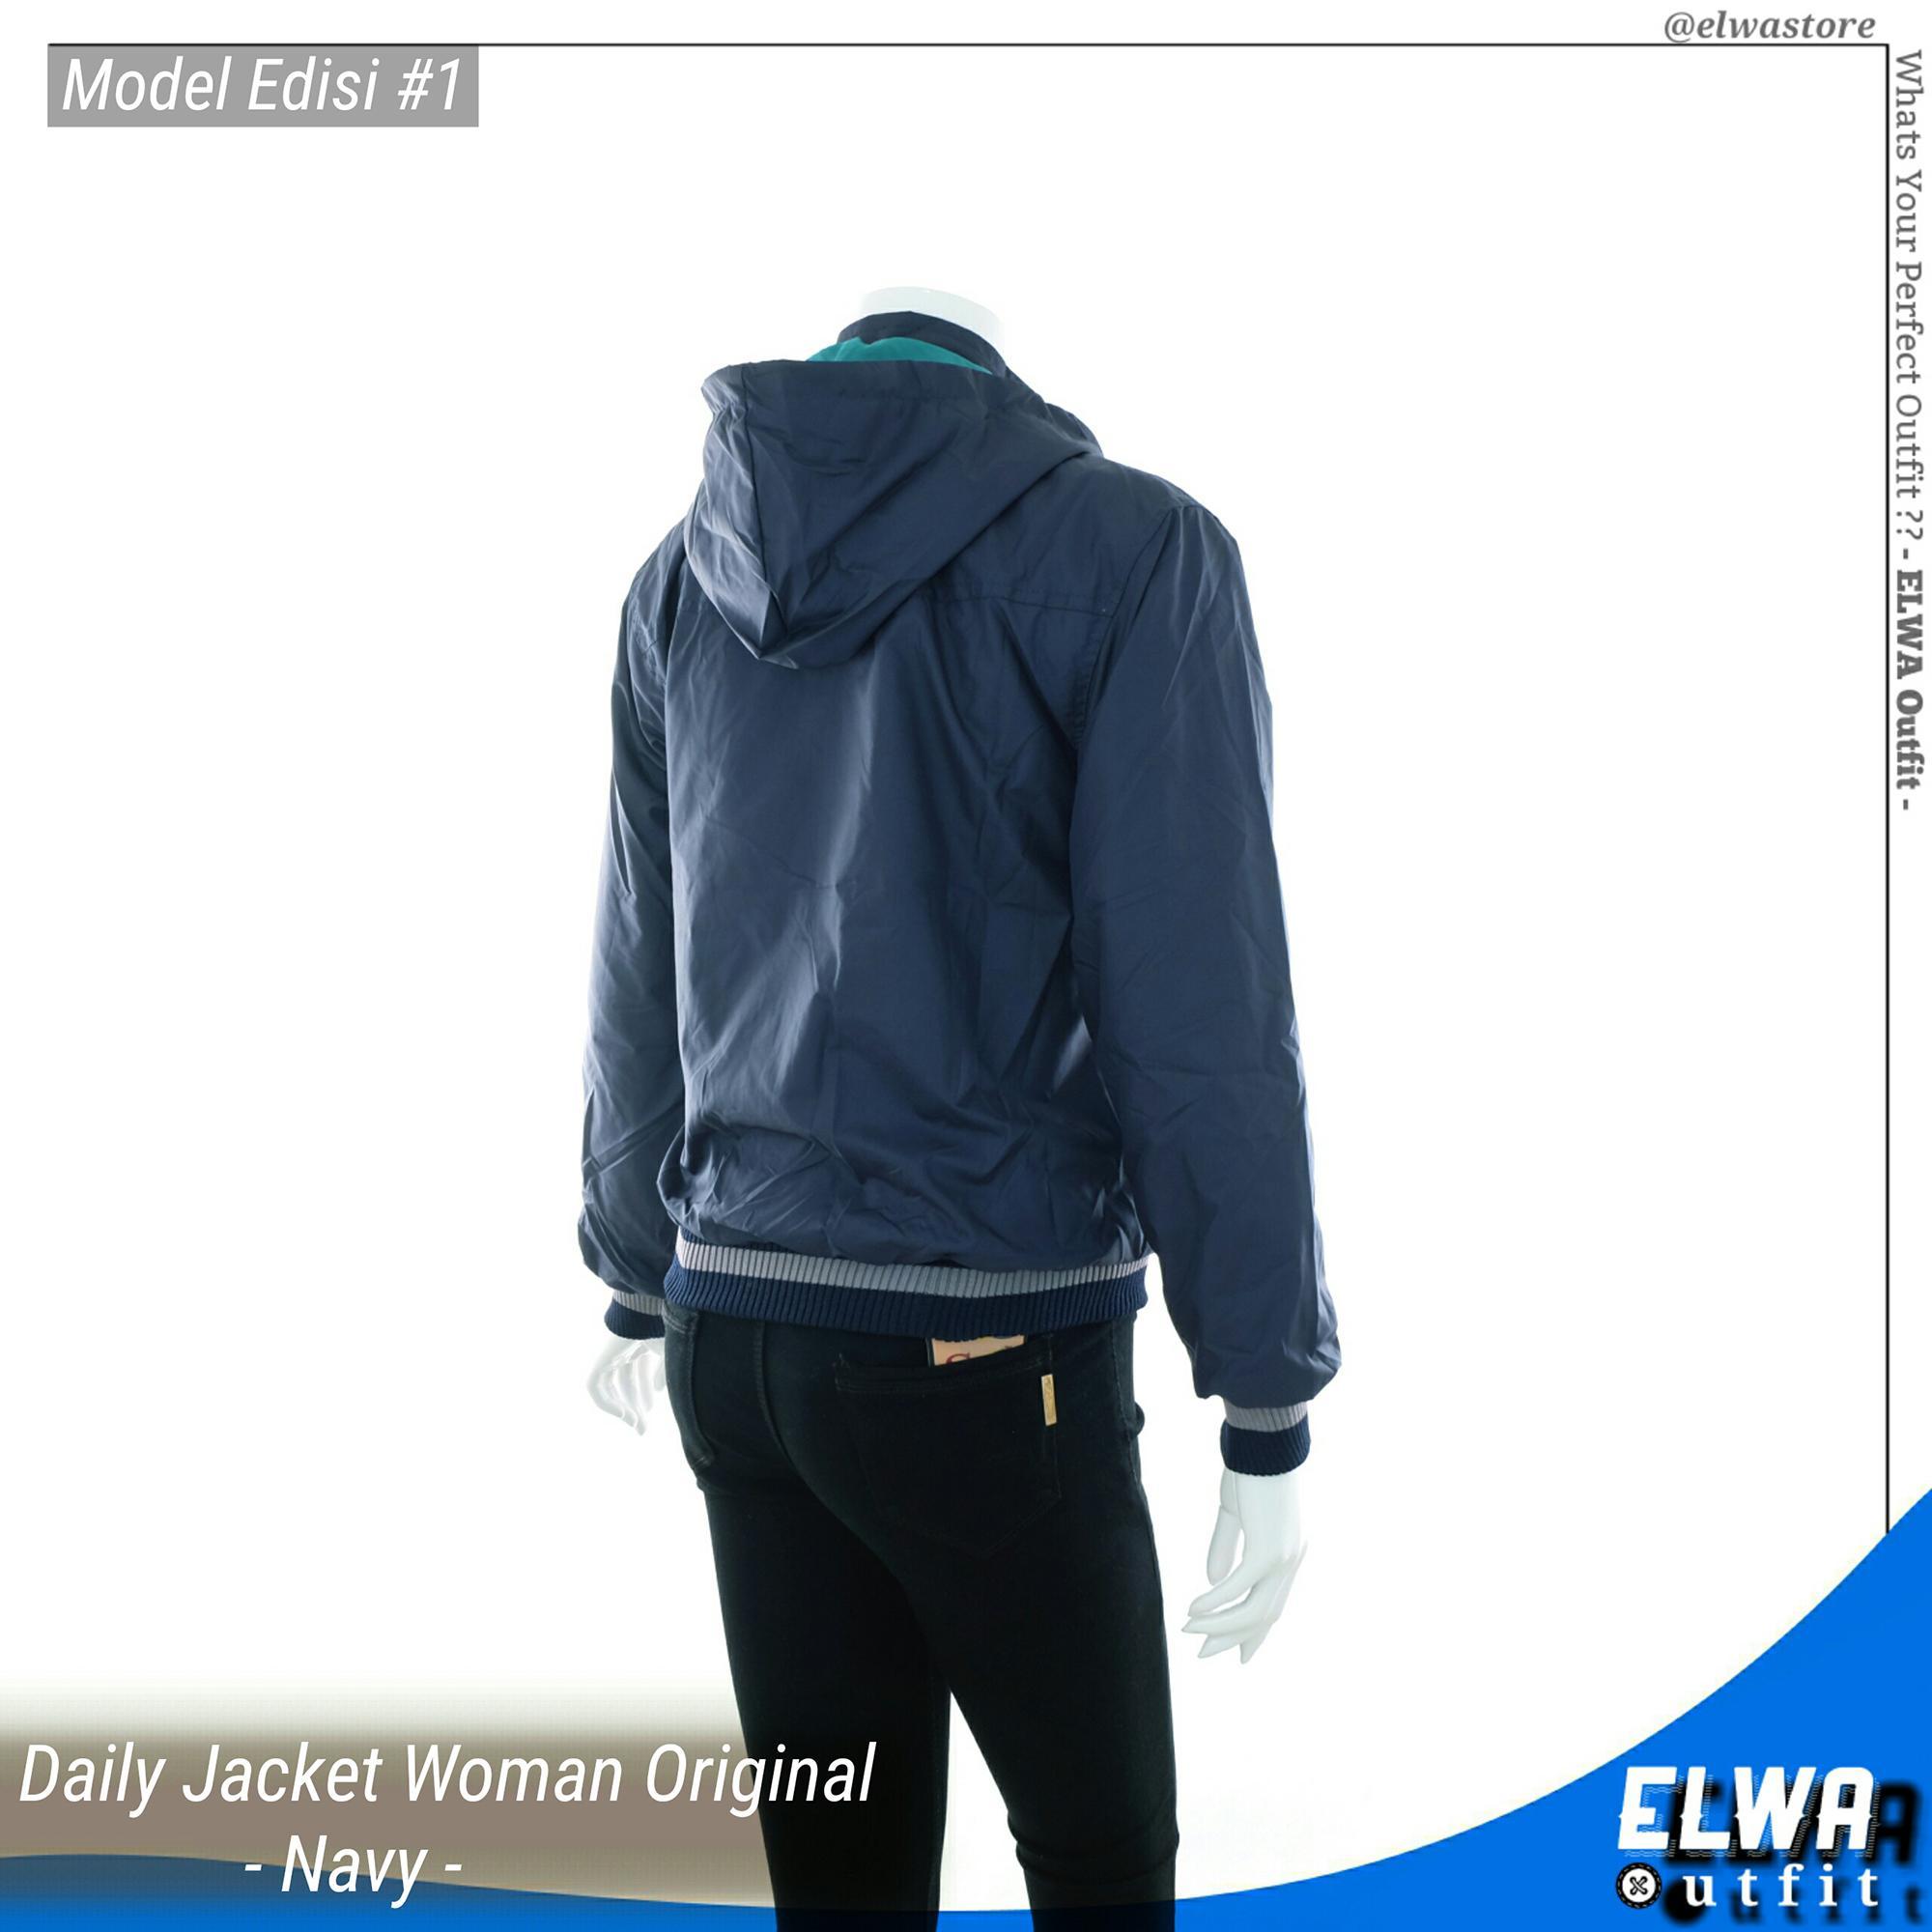 ... ELWA Edisi 1 - Jaket Motor Harian Wanita Anti Angin Waterproof Bolak Balik [Navy] ...